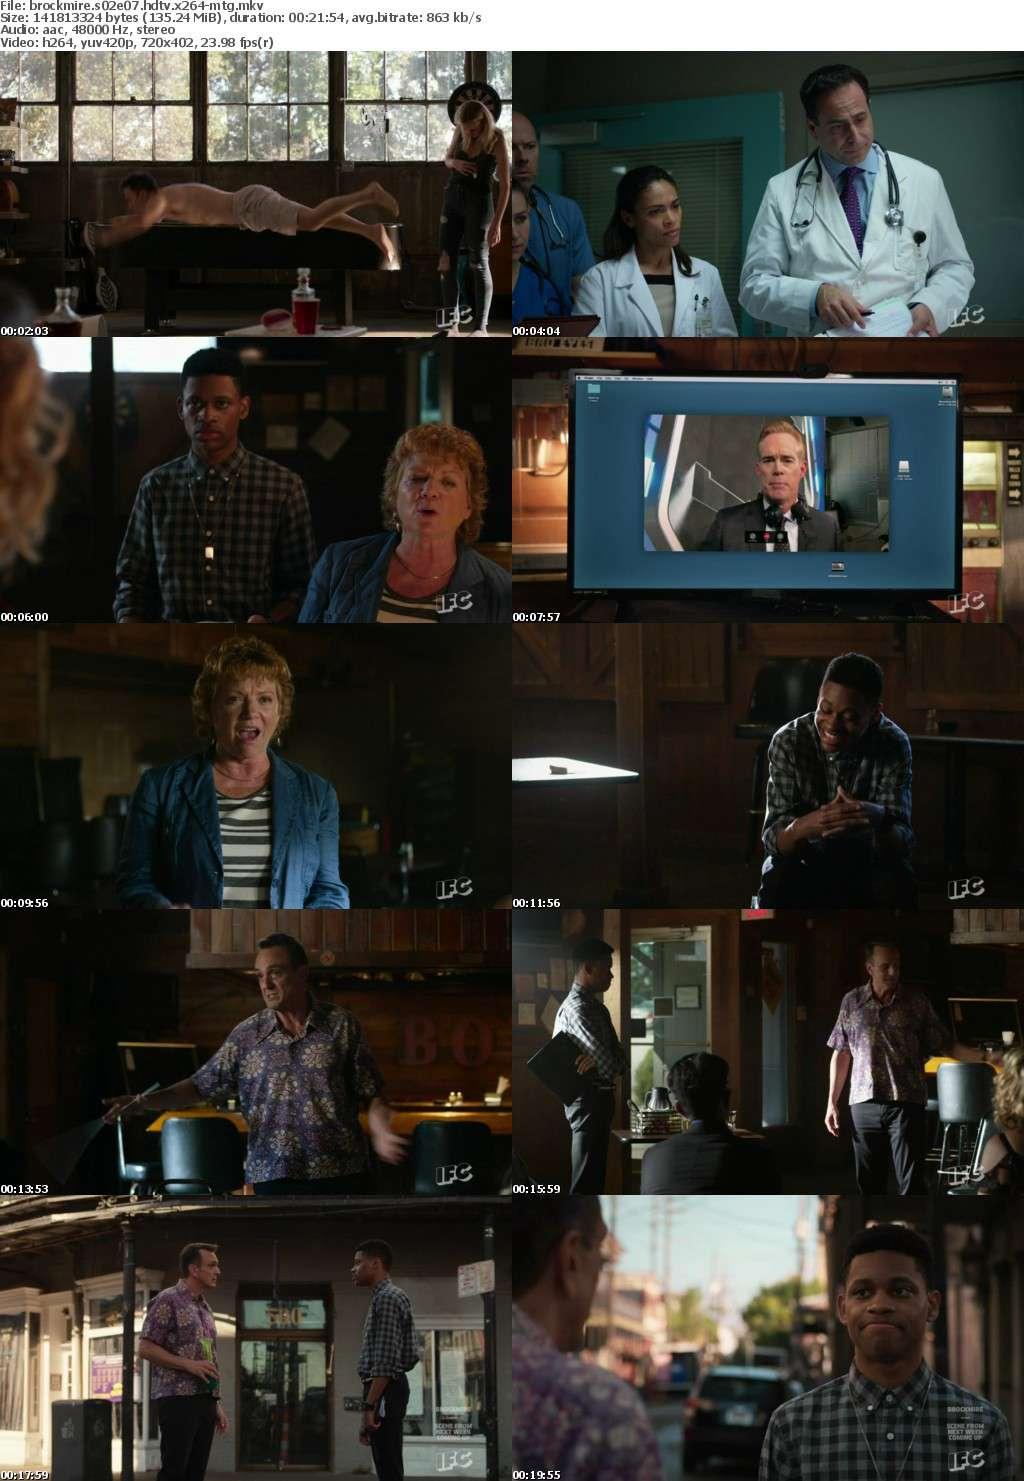 Brockmire S02E07 iNTERNAL HDTV x264-MiNDTHEGAP